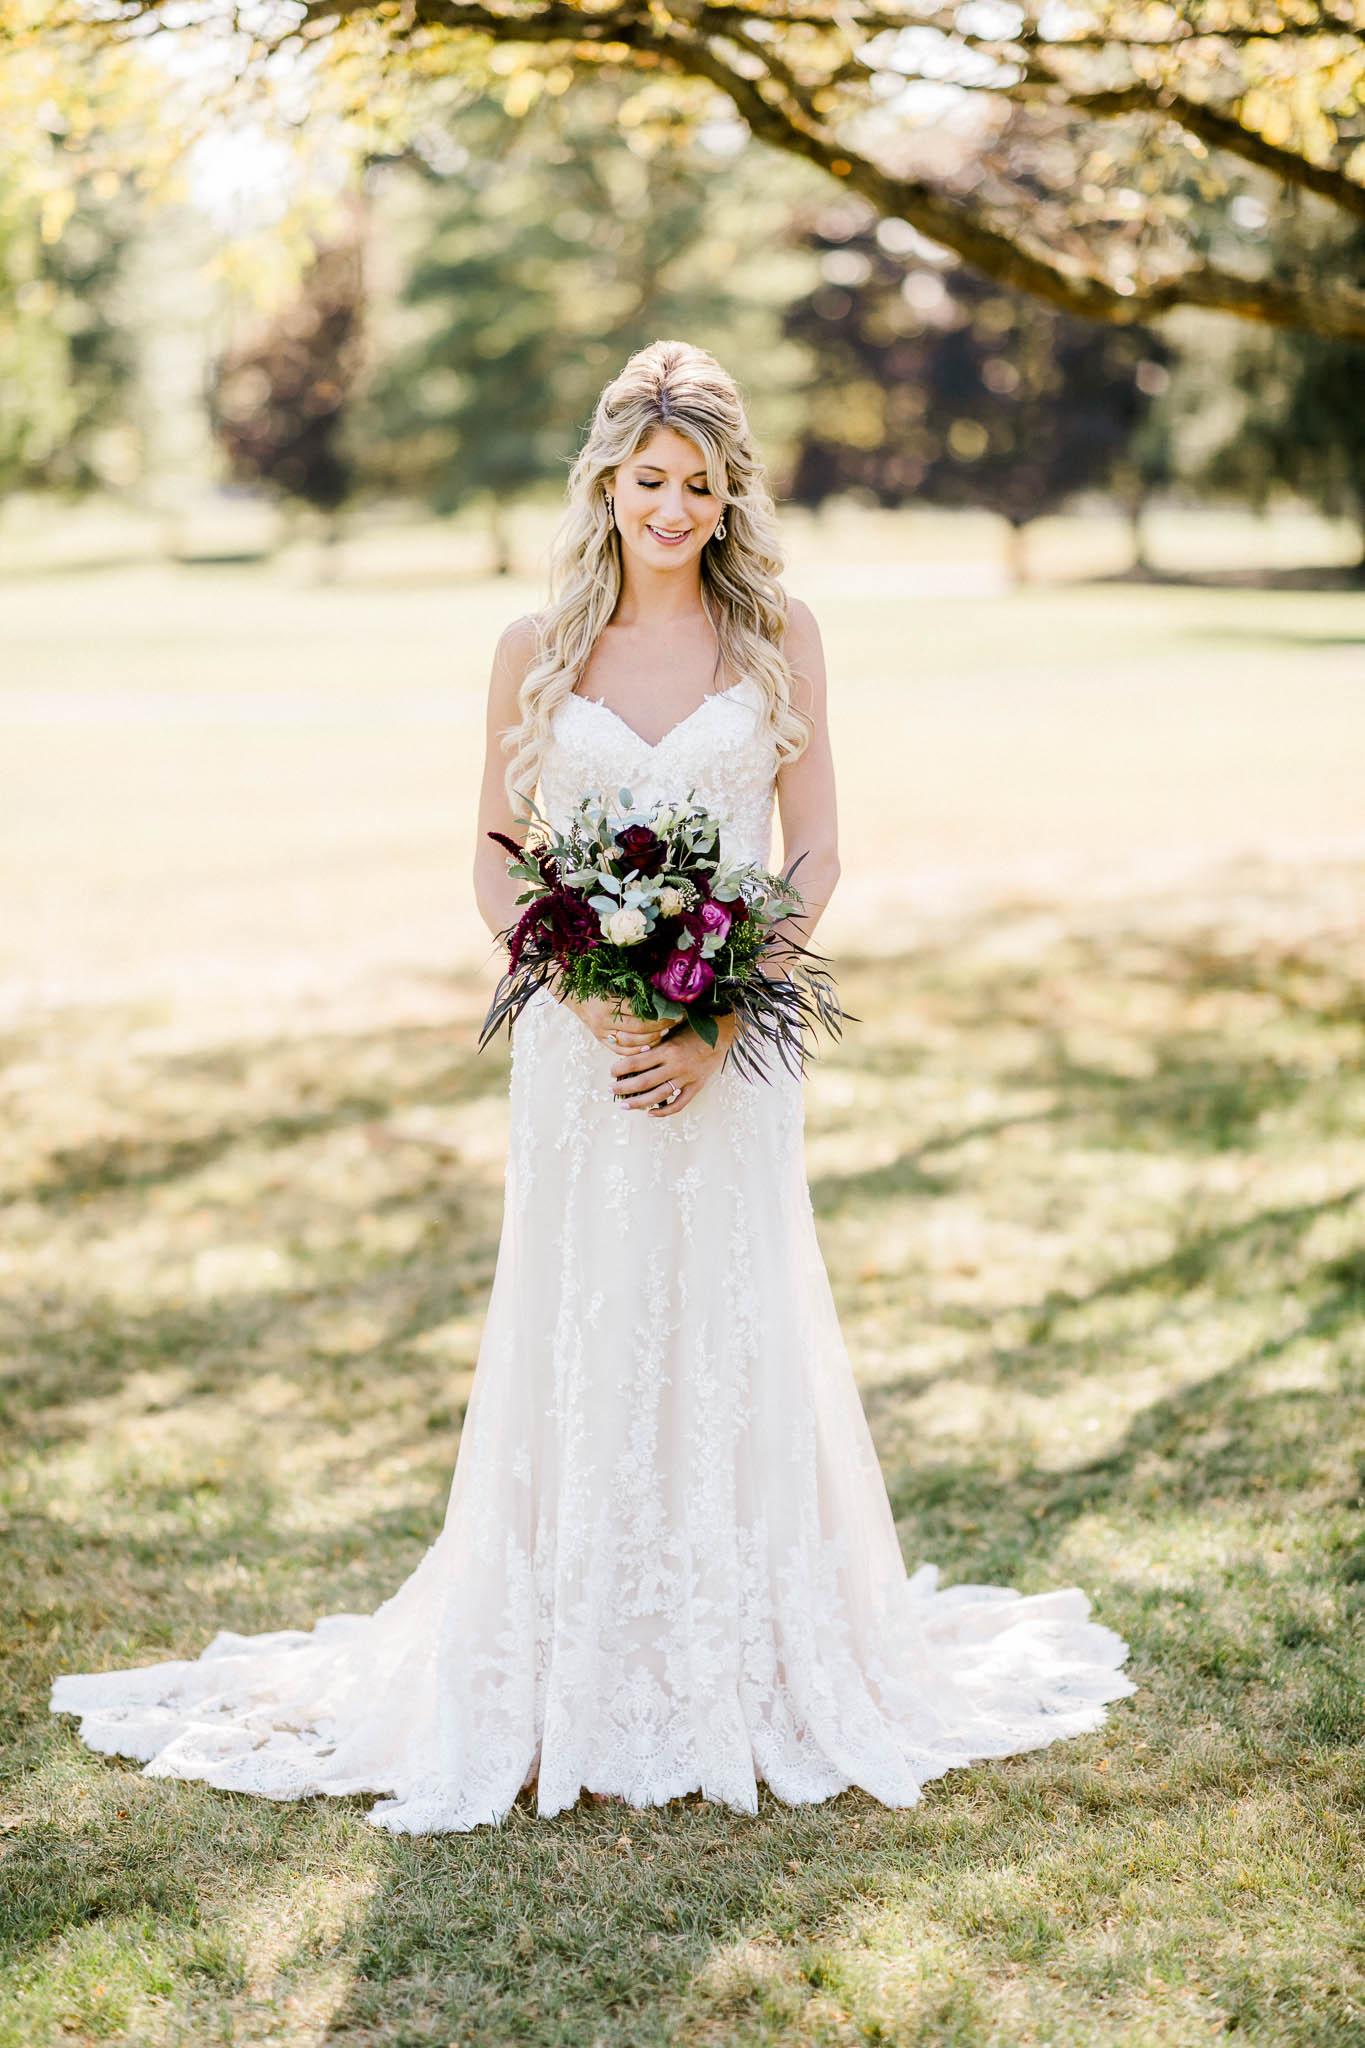 Frosty-Valley-September-Wedding-7549-2.jpg